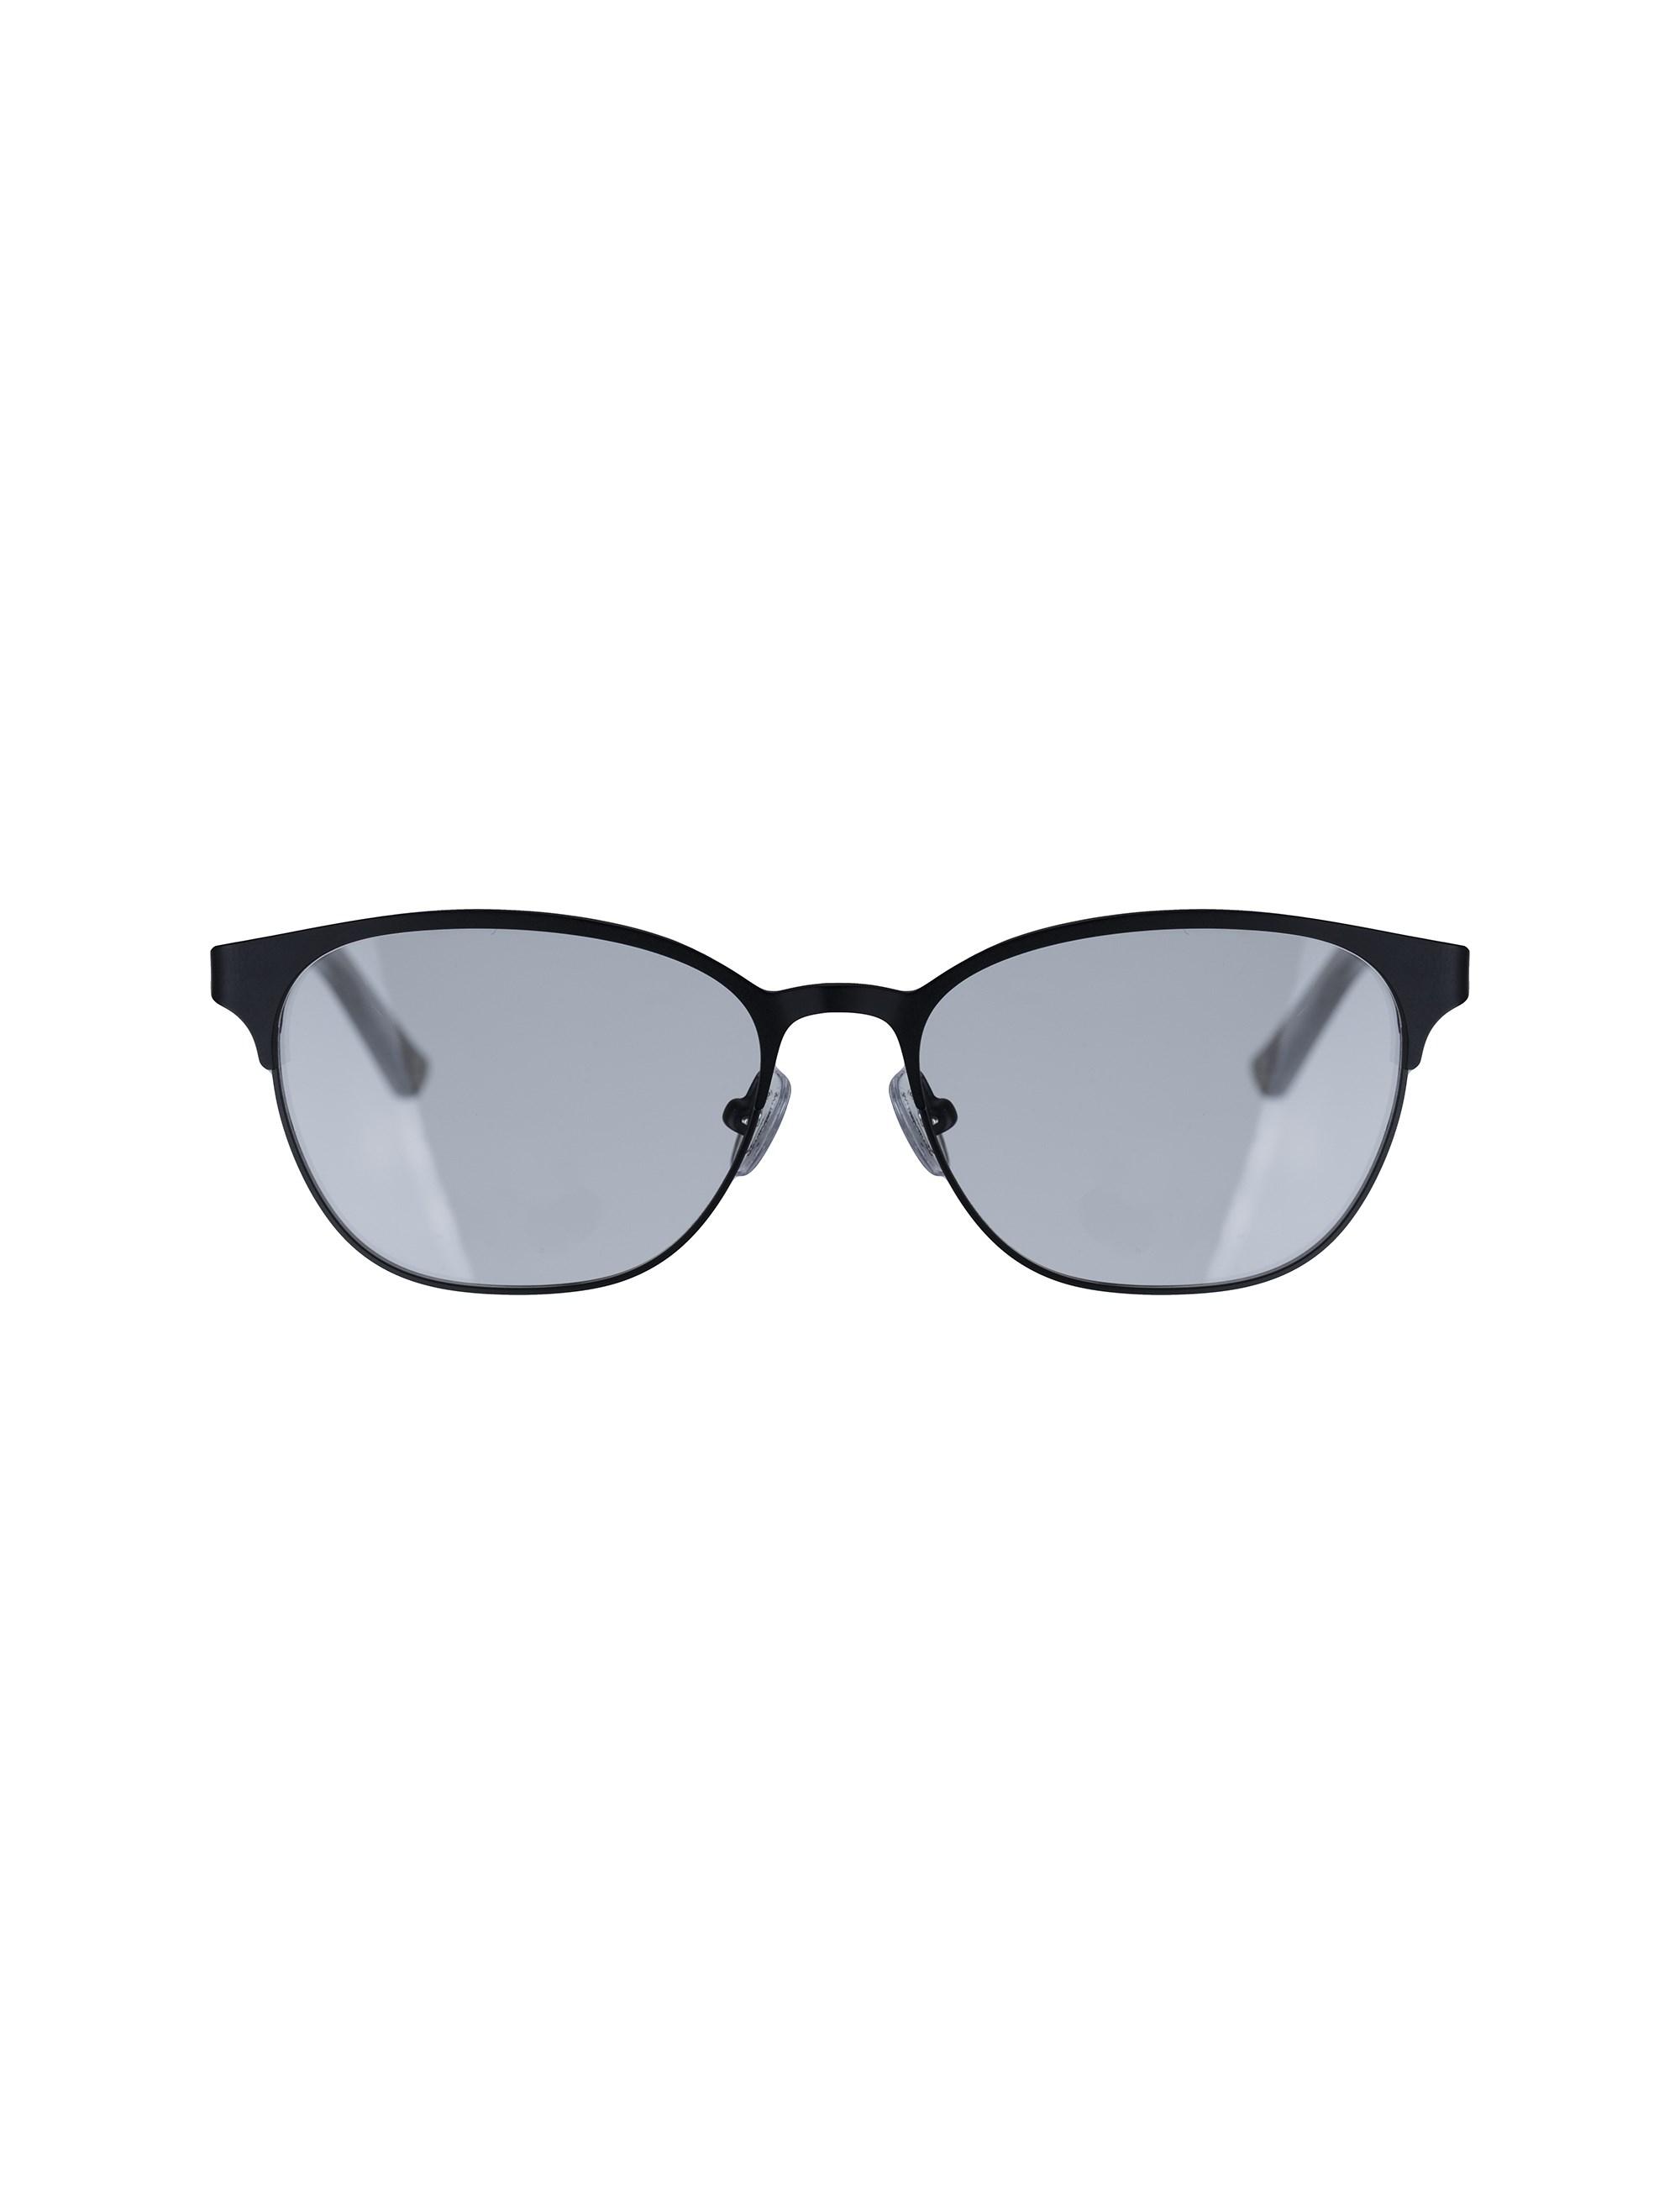 قیمت عینک طبی ویفرر زنانه - پپه جینز